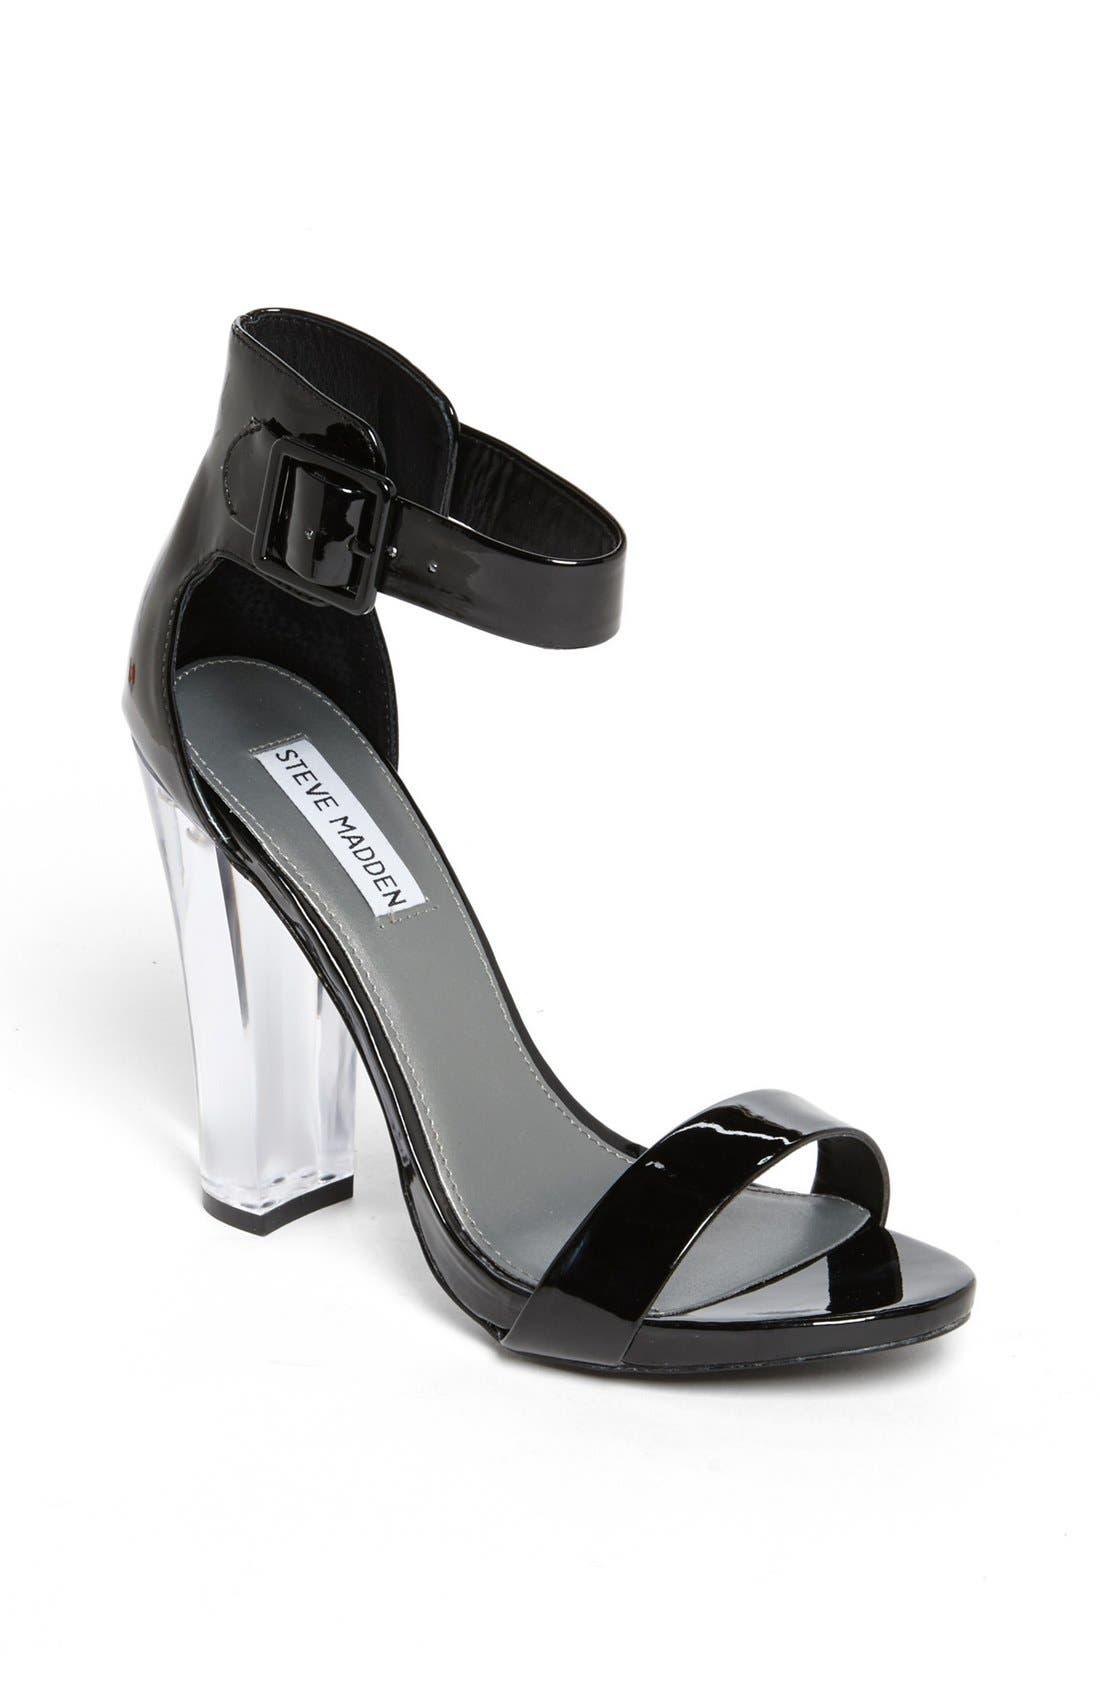 Main Image - Steve Madden 'Madame' Black Patent Sandal